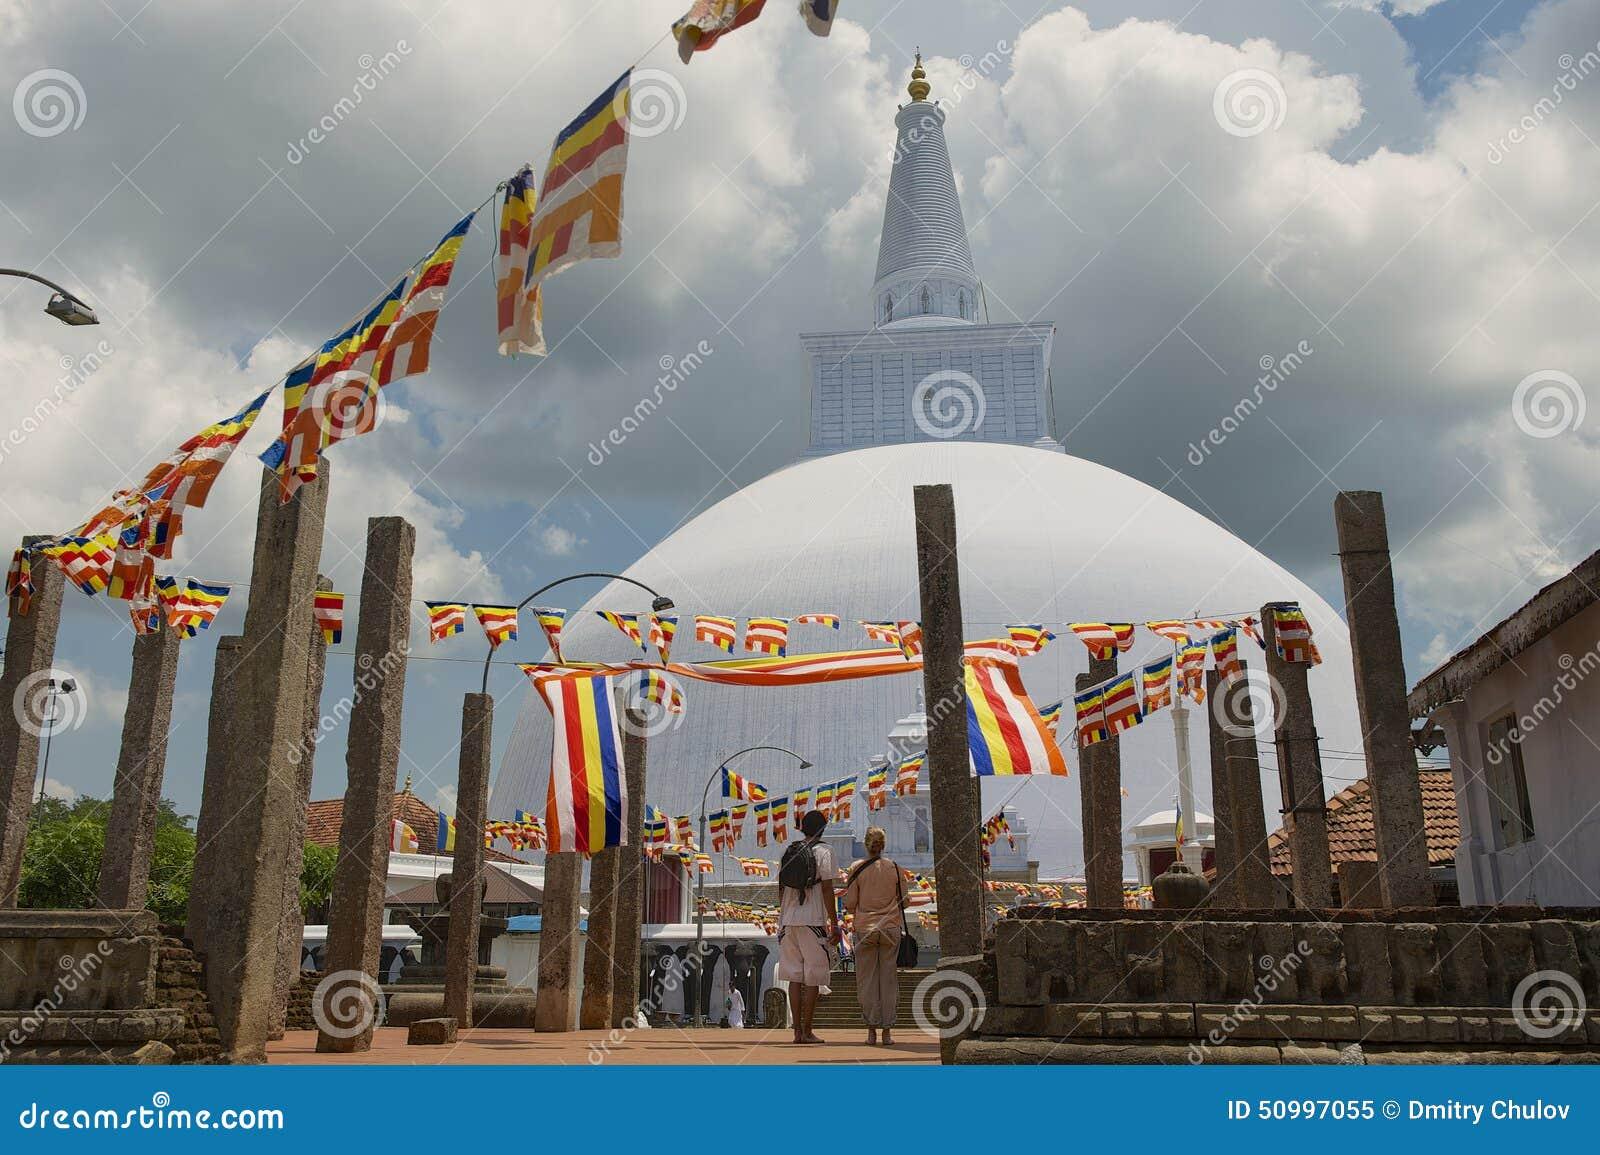 People enjoy the view to the Ruwanwelisaya stupa in Anuradhapura, Sri Lanka.